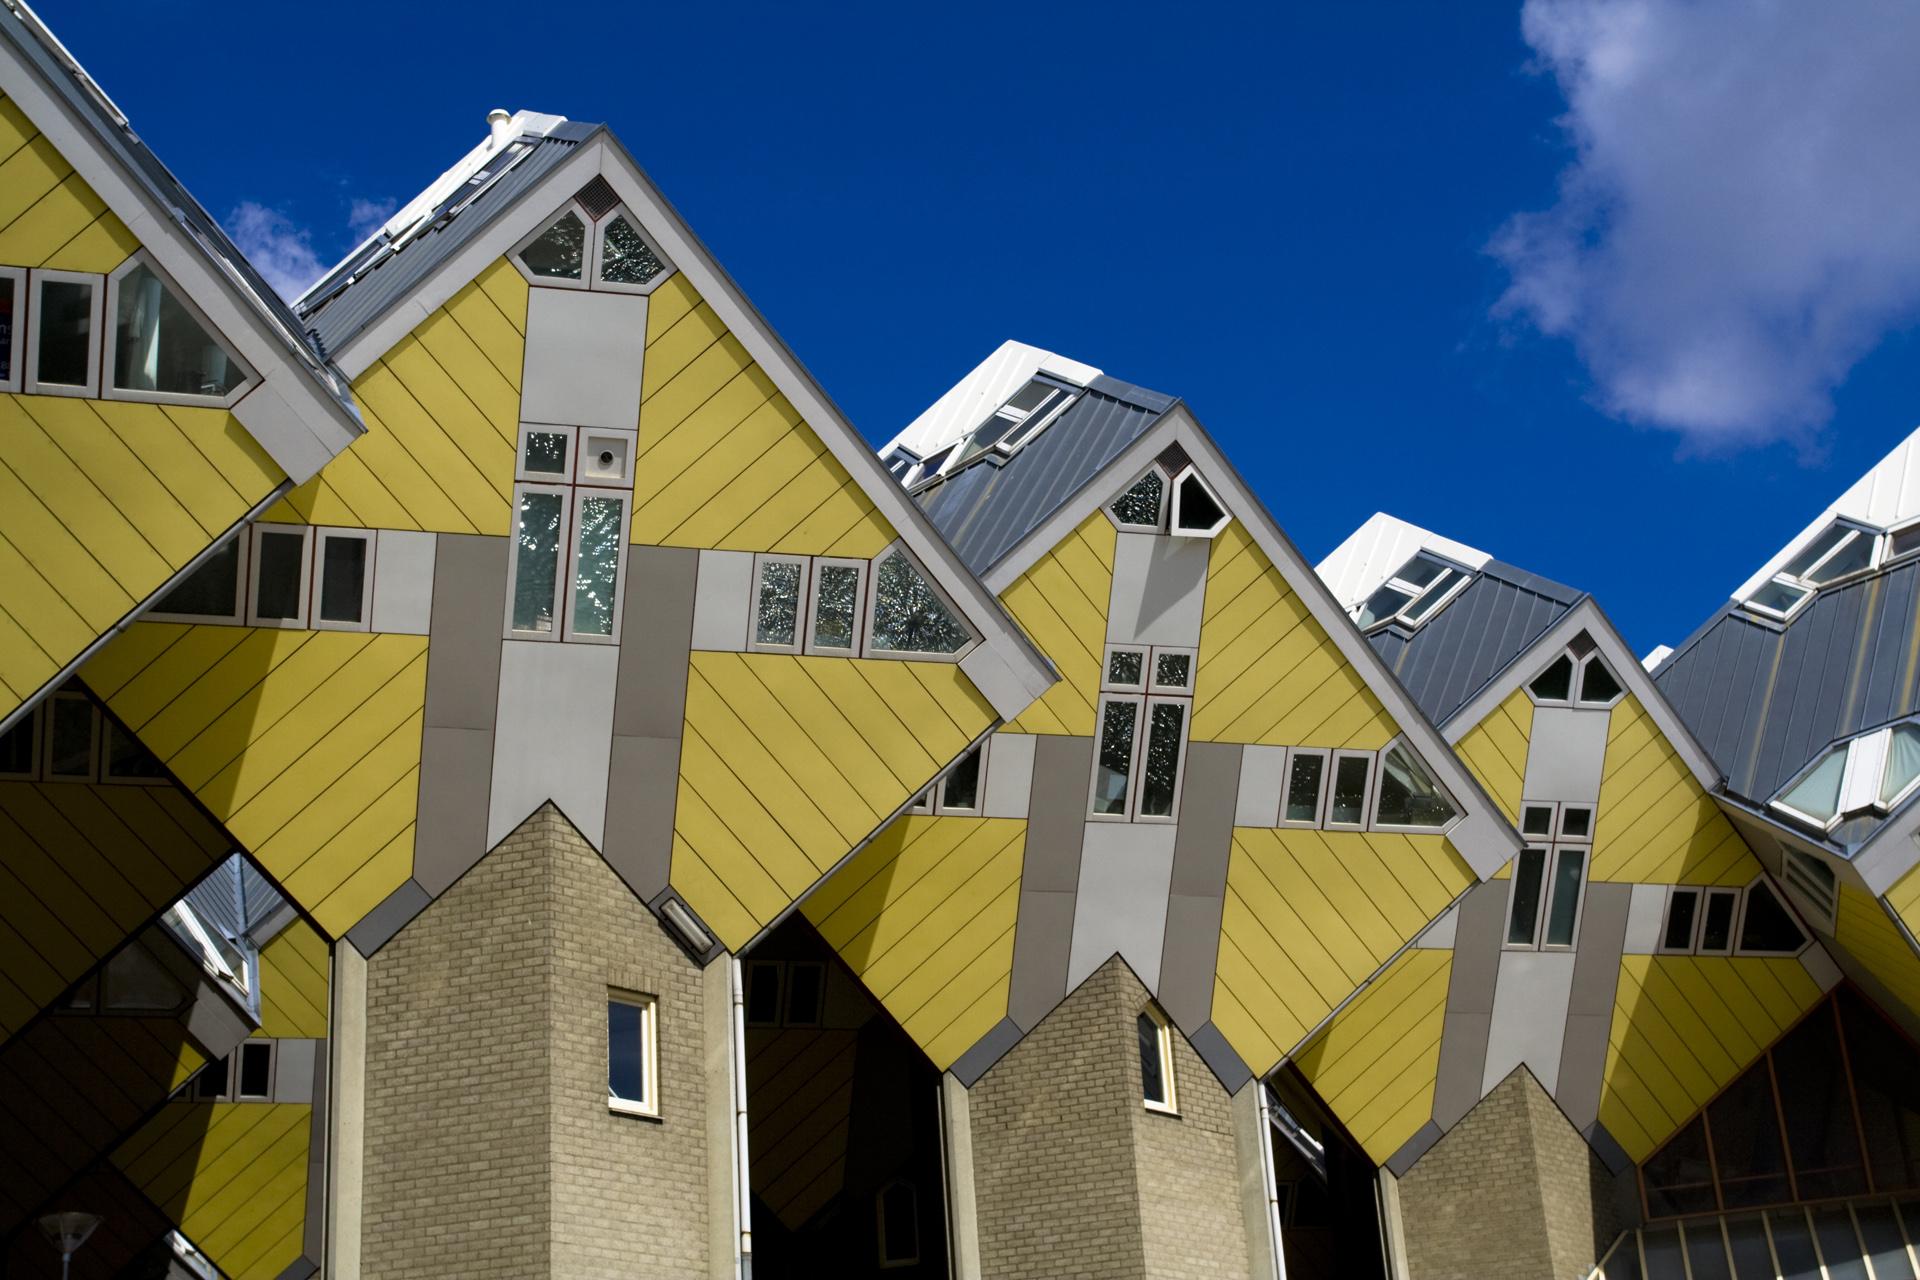 Rotterdam dagje uit kubus-woningen